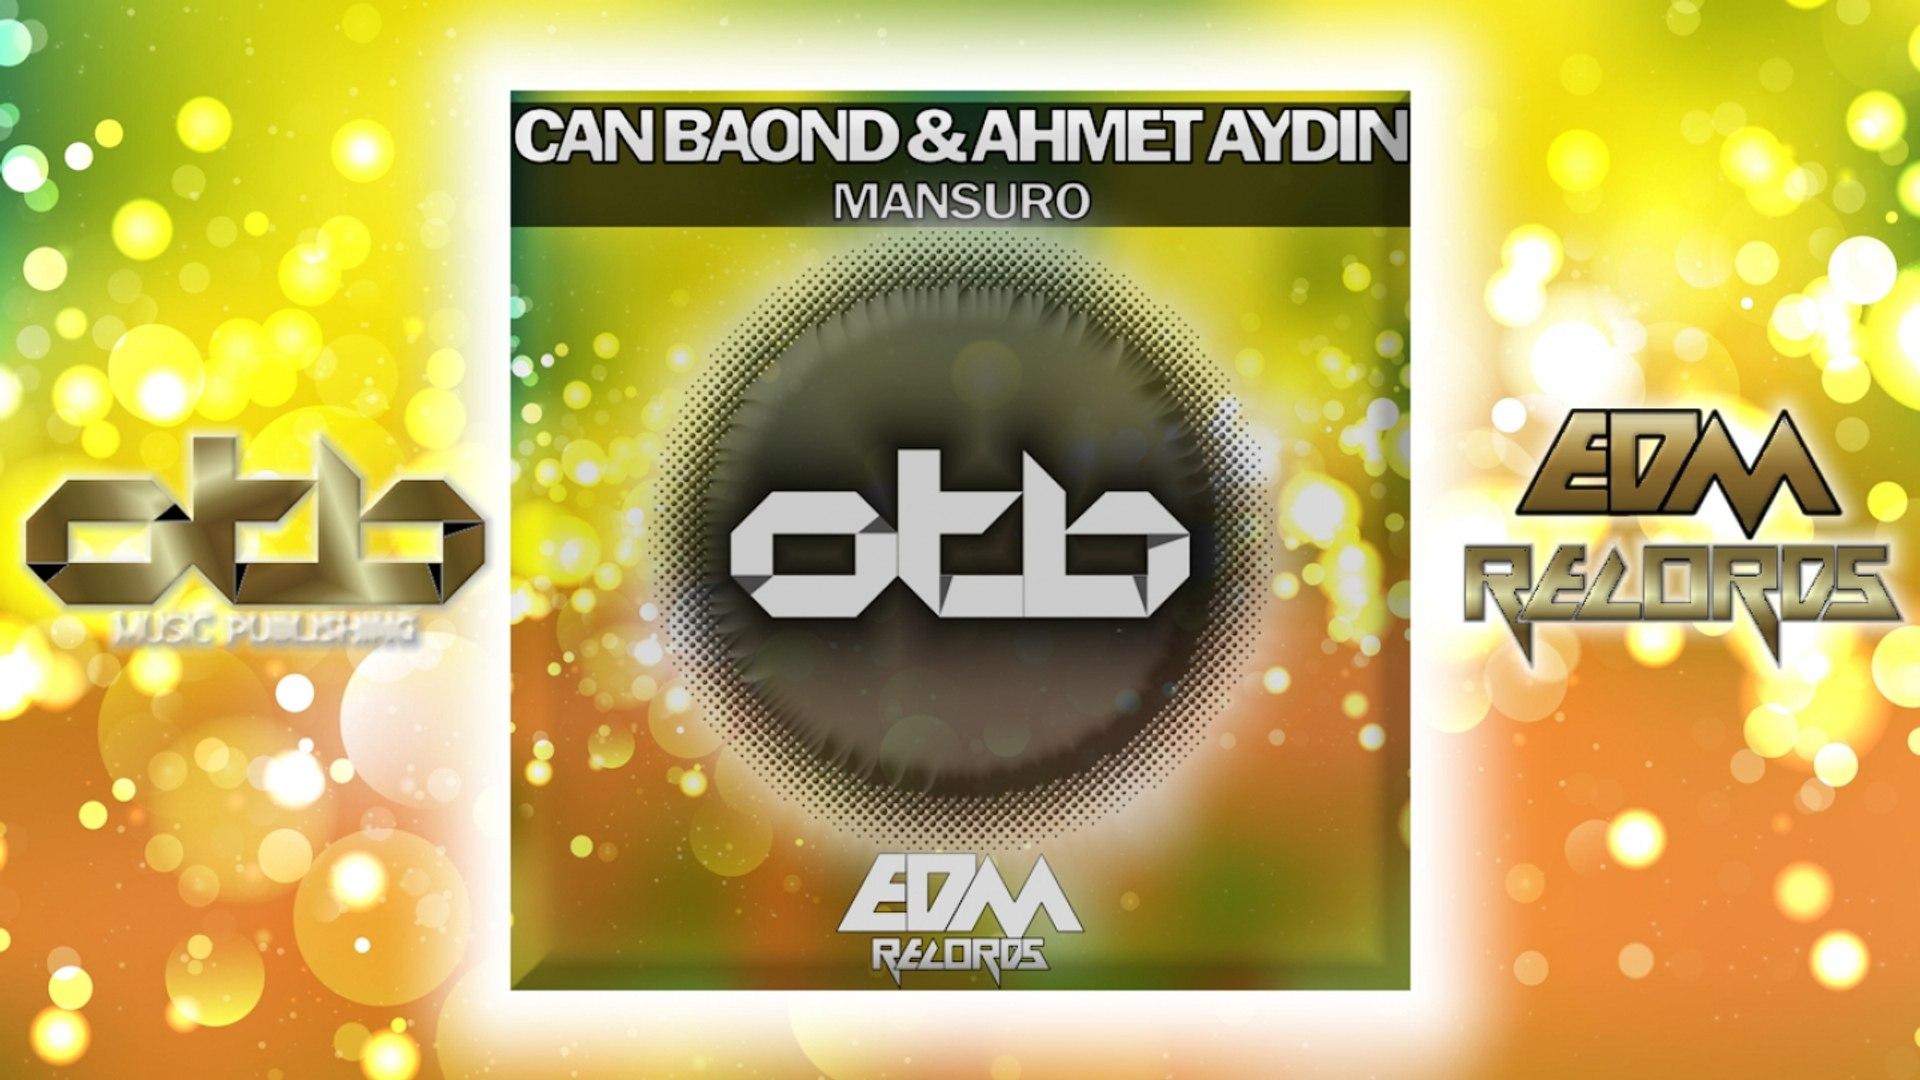 Can Baond, Ahmet Aydin - Mansuro - [EDM 2018]